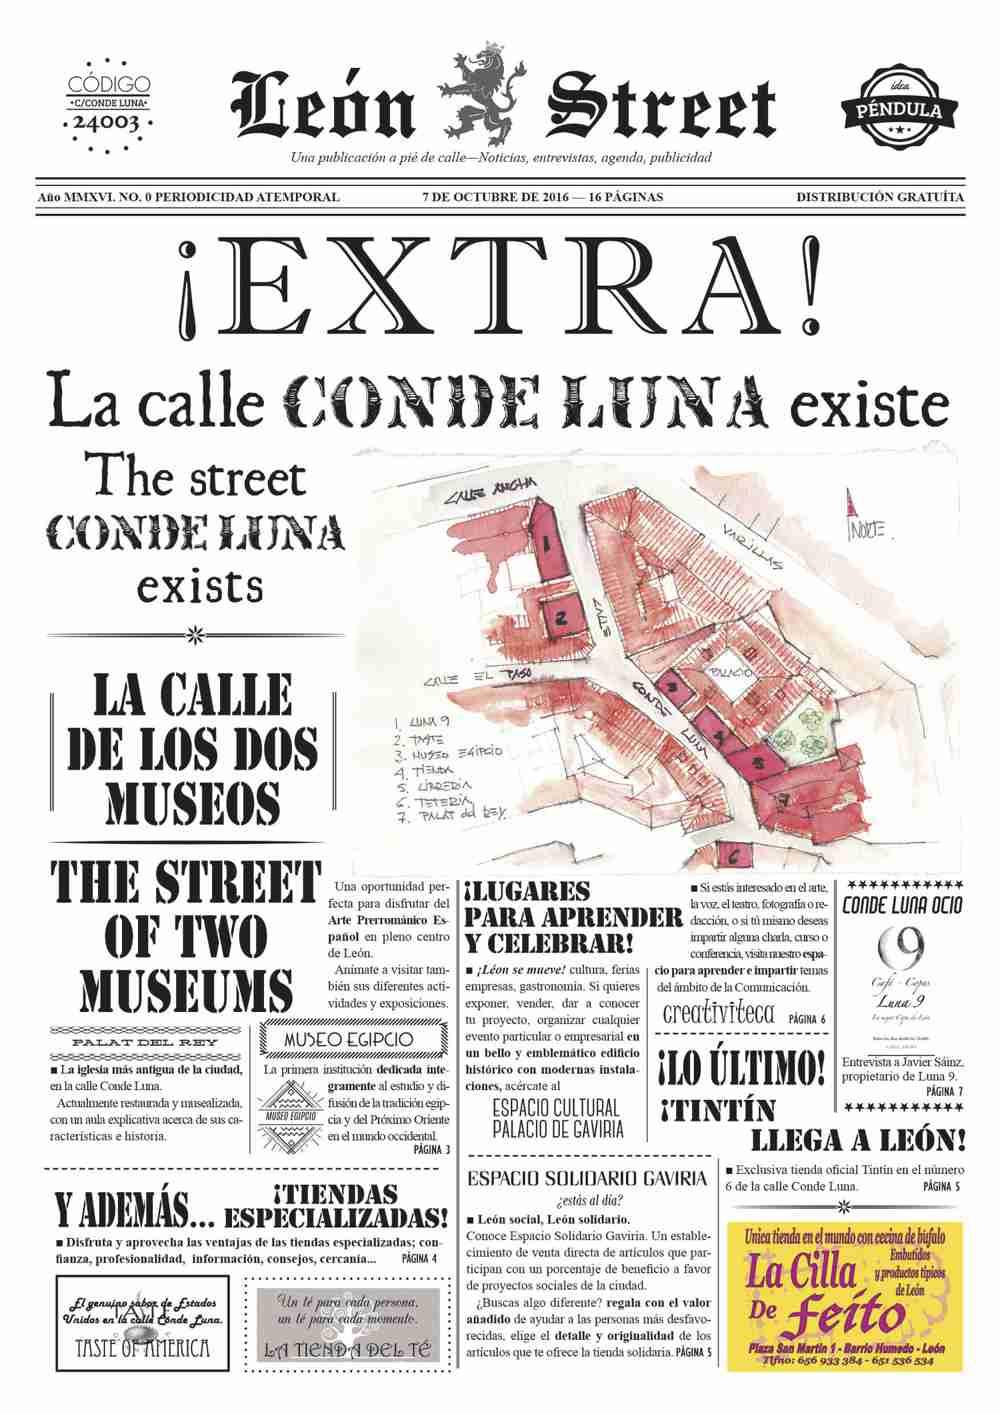 León Street Conde Luna nº 0